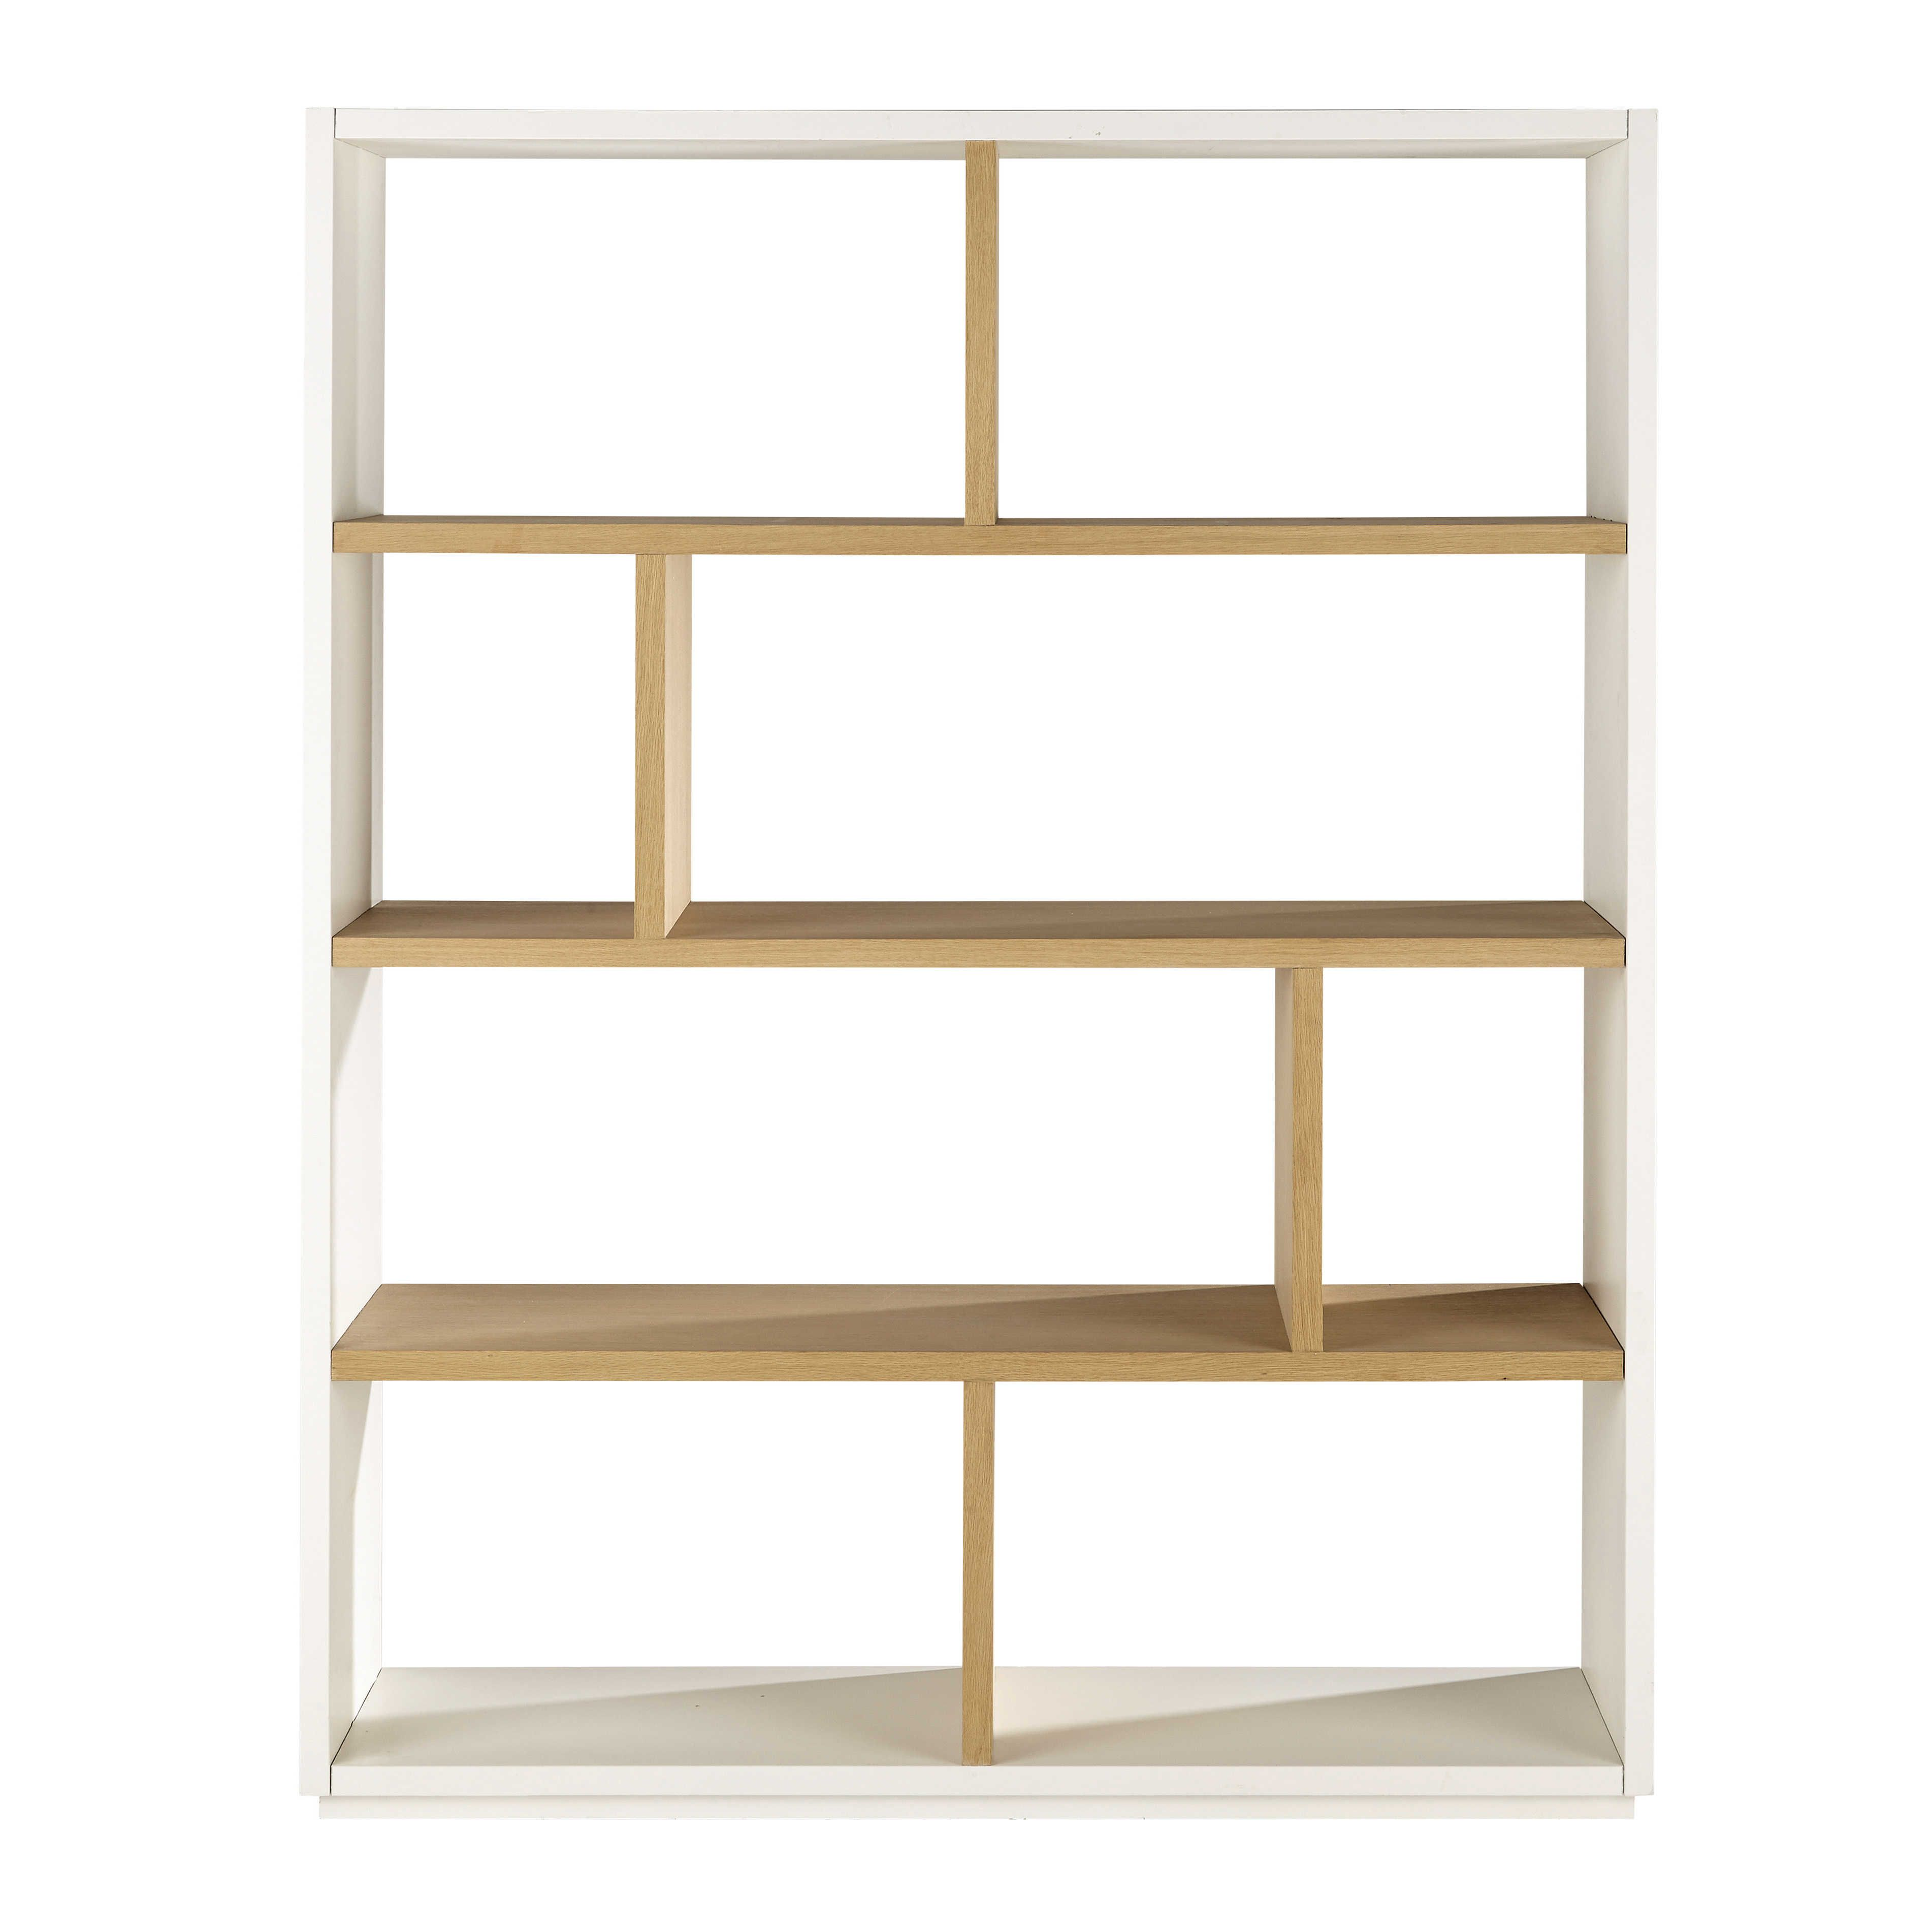 Open Hoekkast Wit.Witte Open Kast Dvd Kast Pinterest Oak Shelves Shelves And